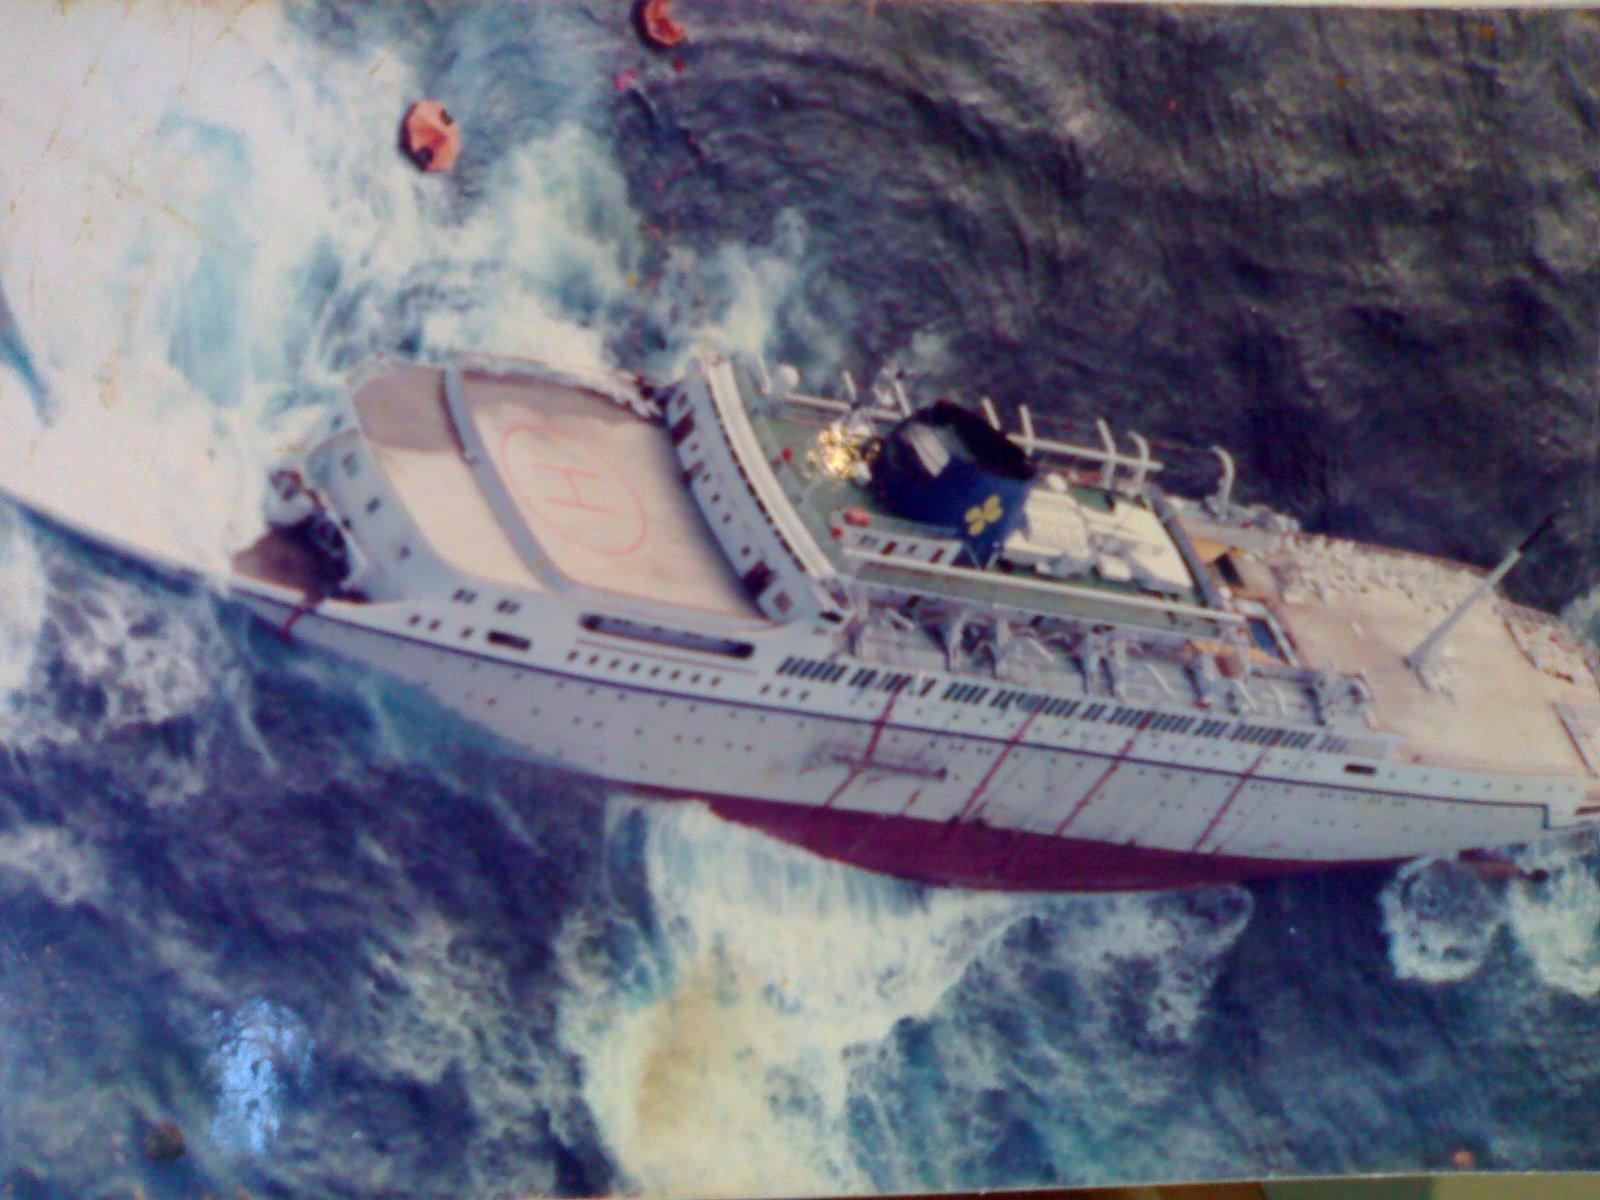 Oceanos Cruise Ship Sinking Fitbudhacom - Sinking cruise ship oceanos